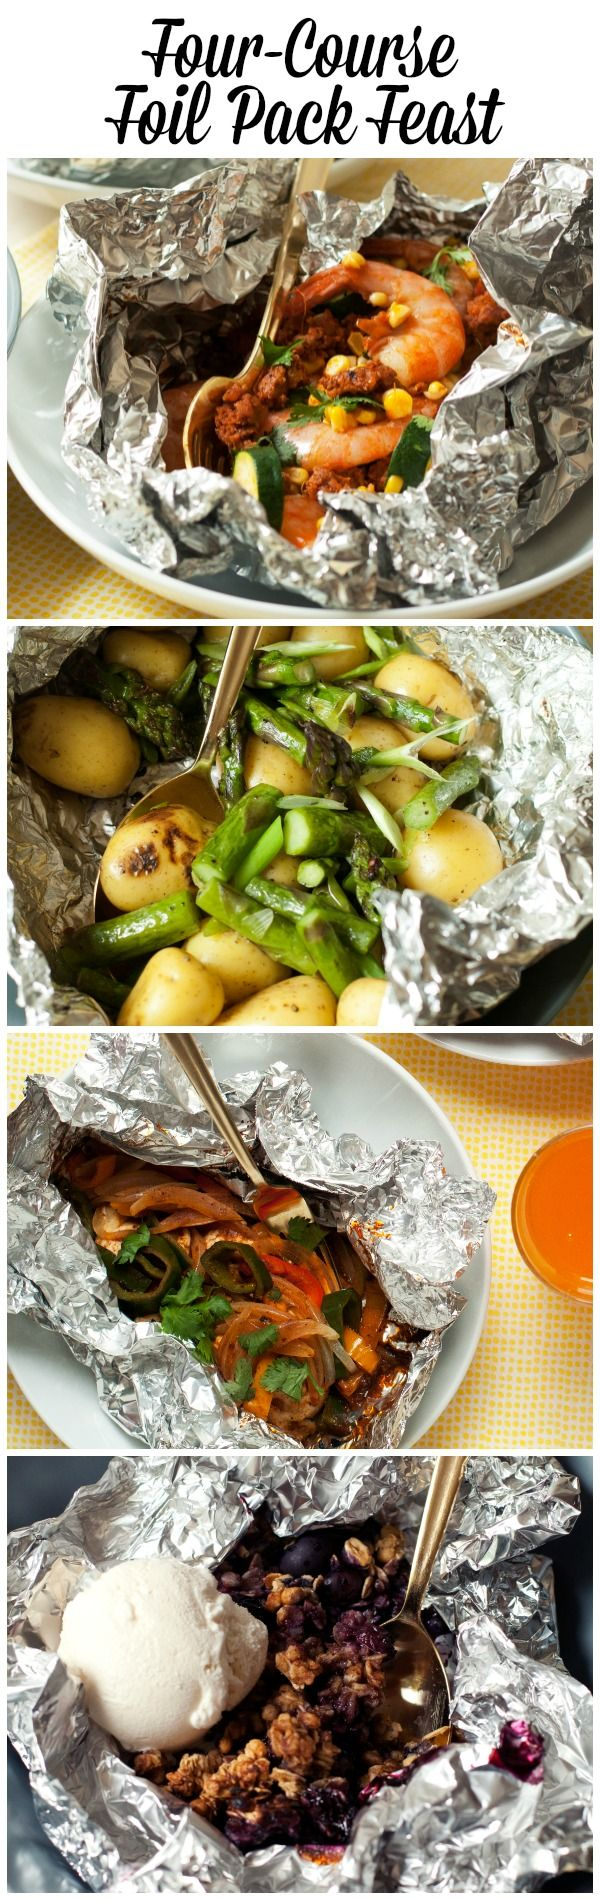 Paquetes de comida envueltos en papel aluminio para cocinar sobre brasas/al carbón